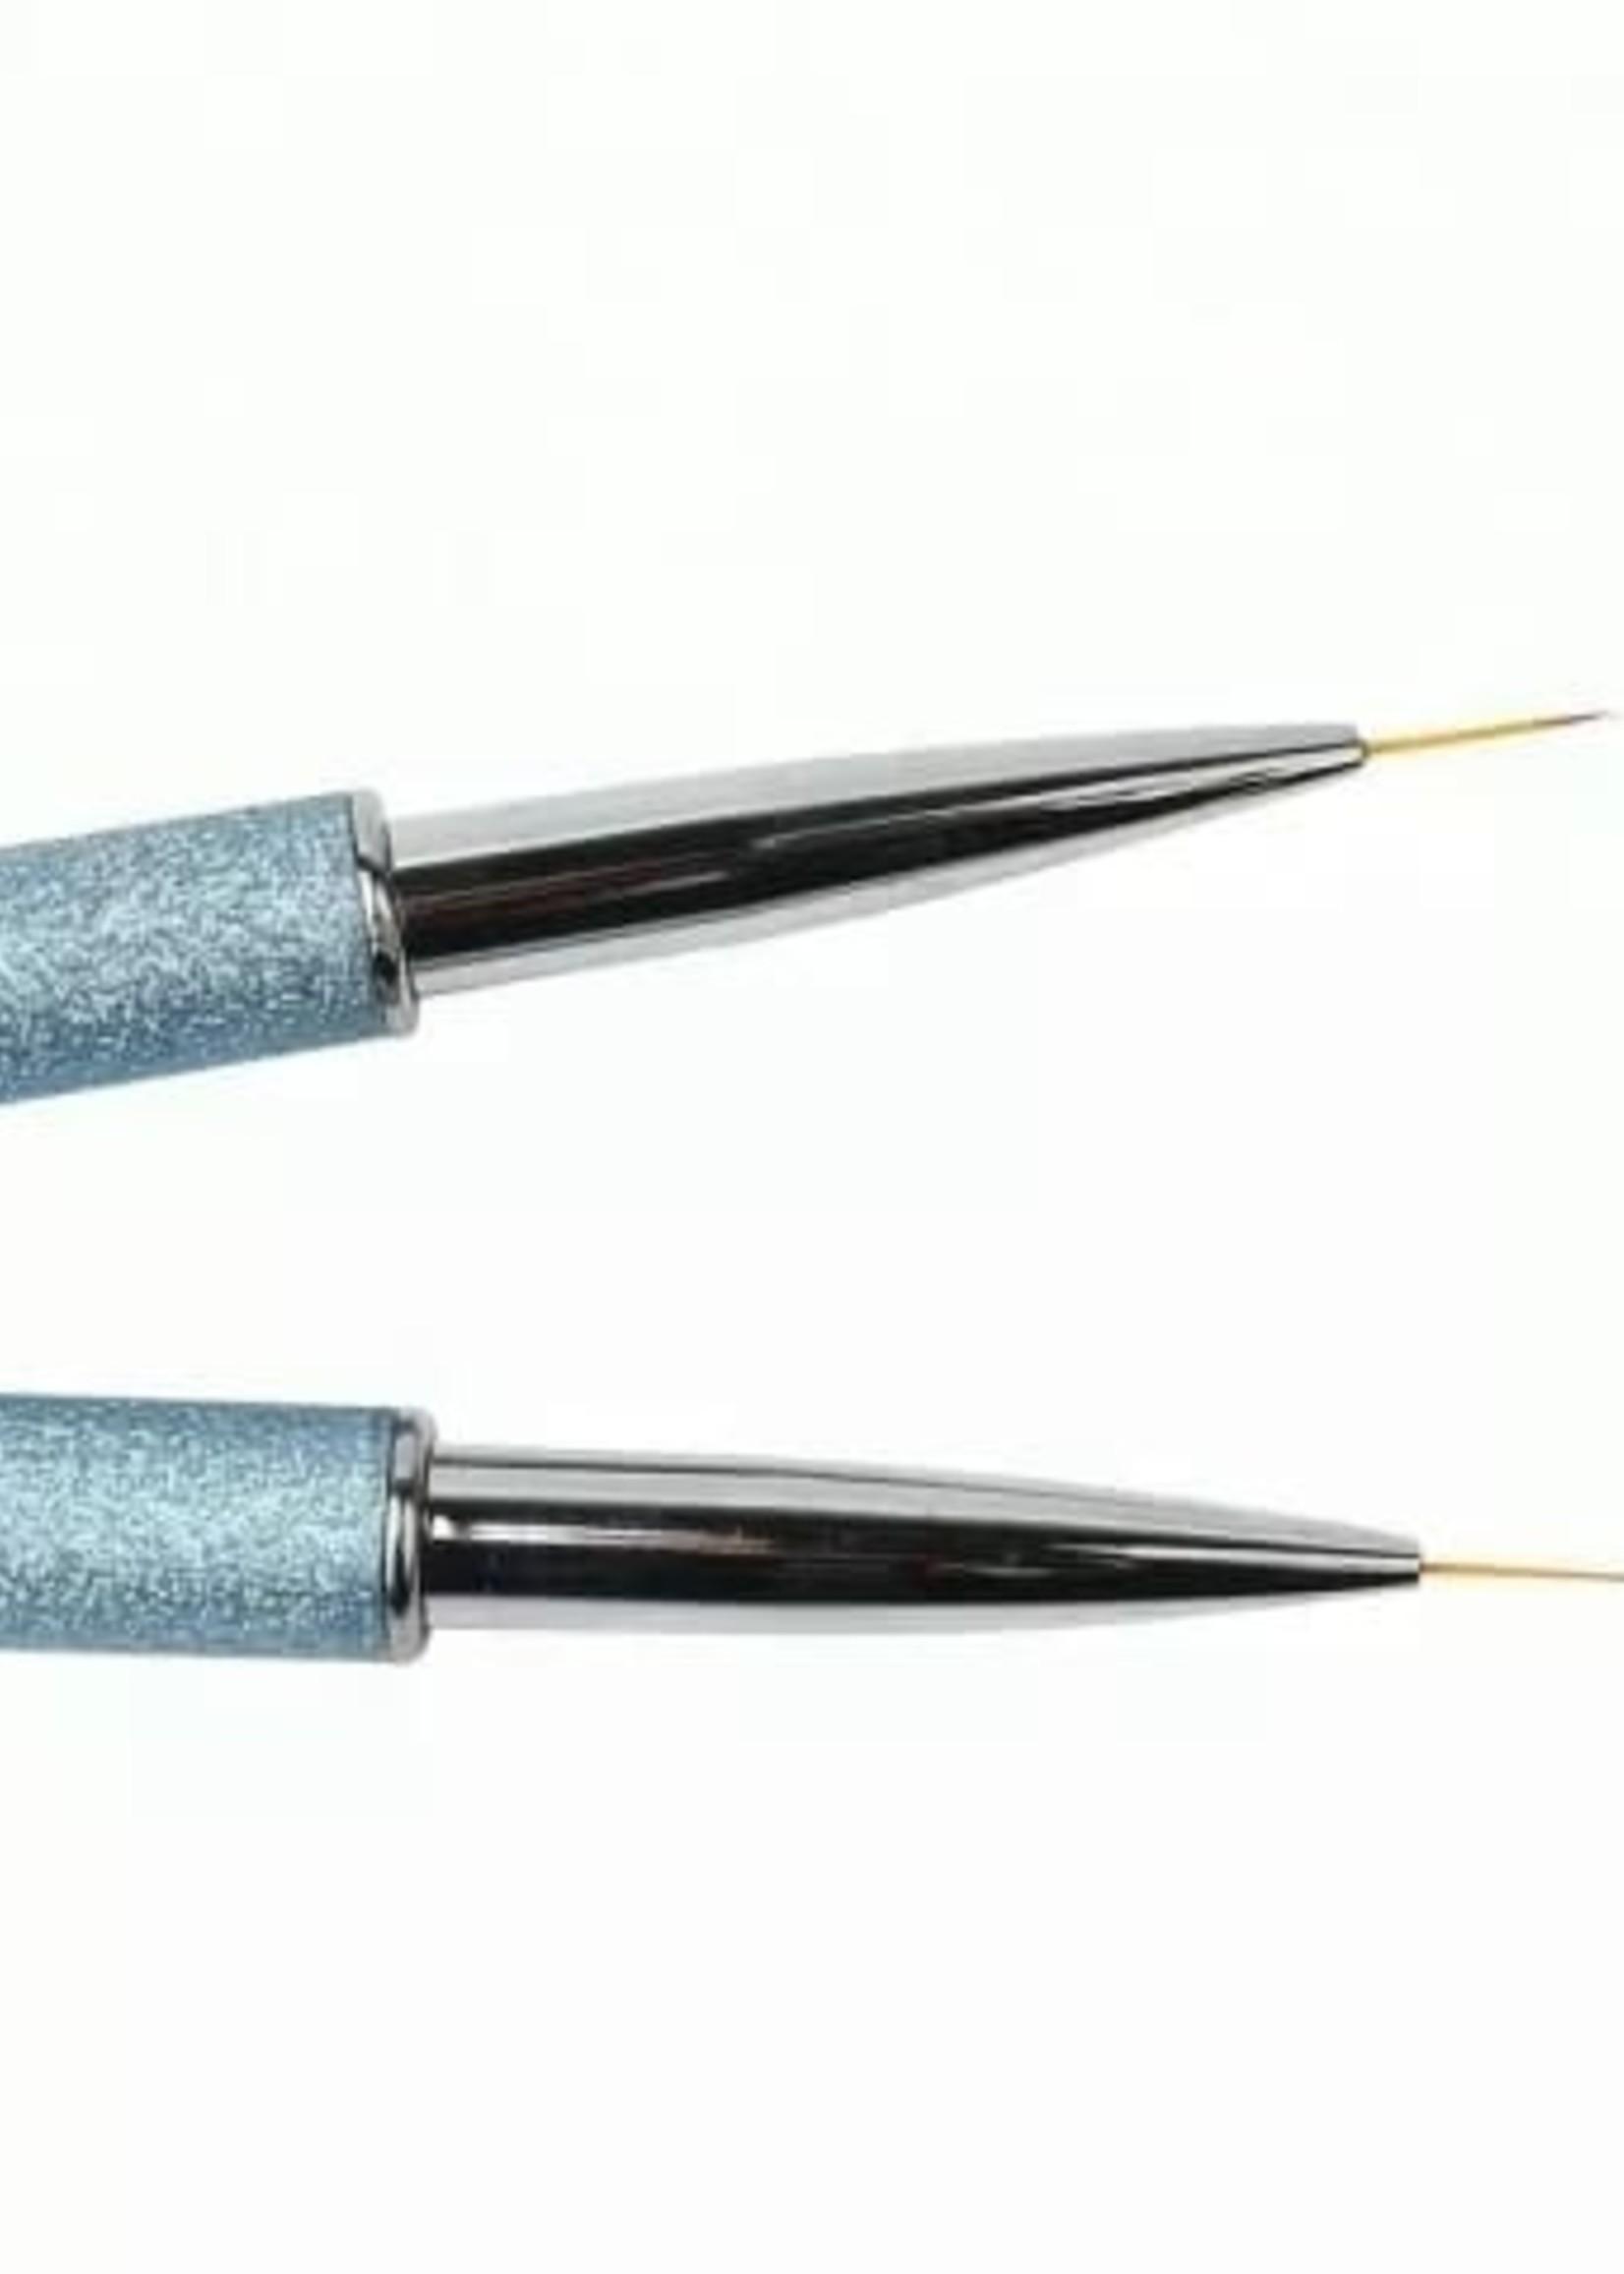 Nail art penseel 7 mm